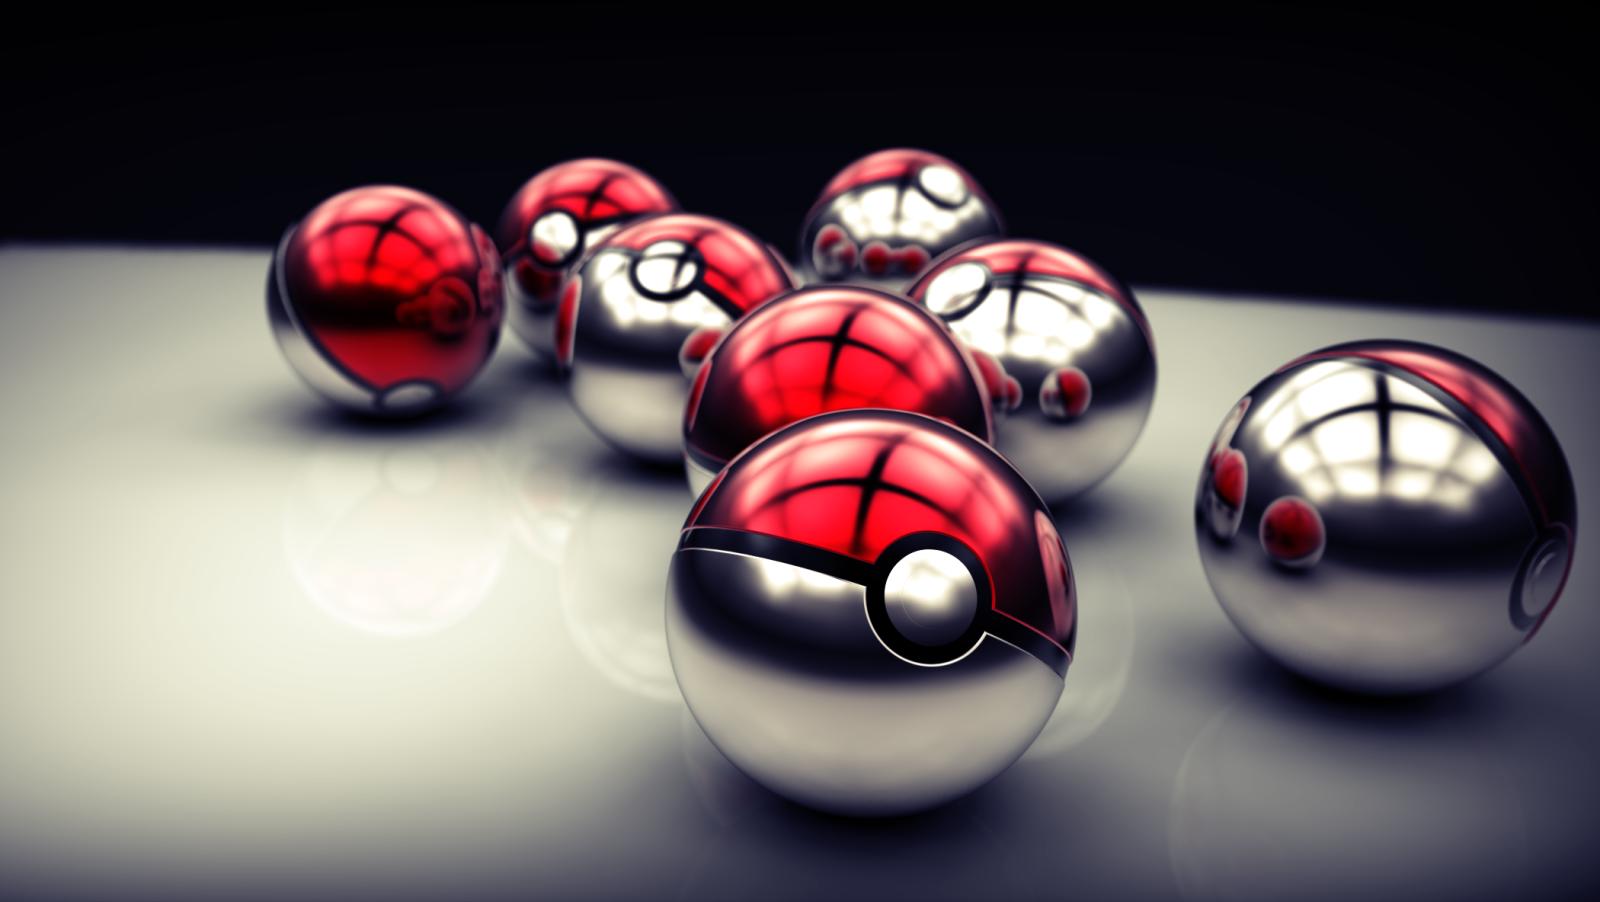 Anime - Pokémon  Pokeball Wallpaper